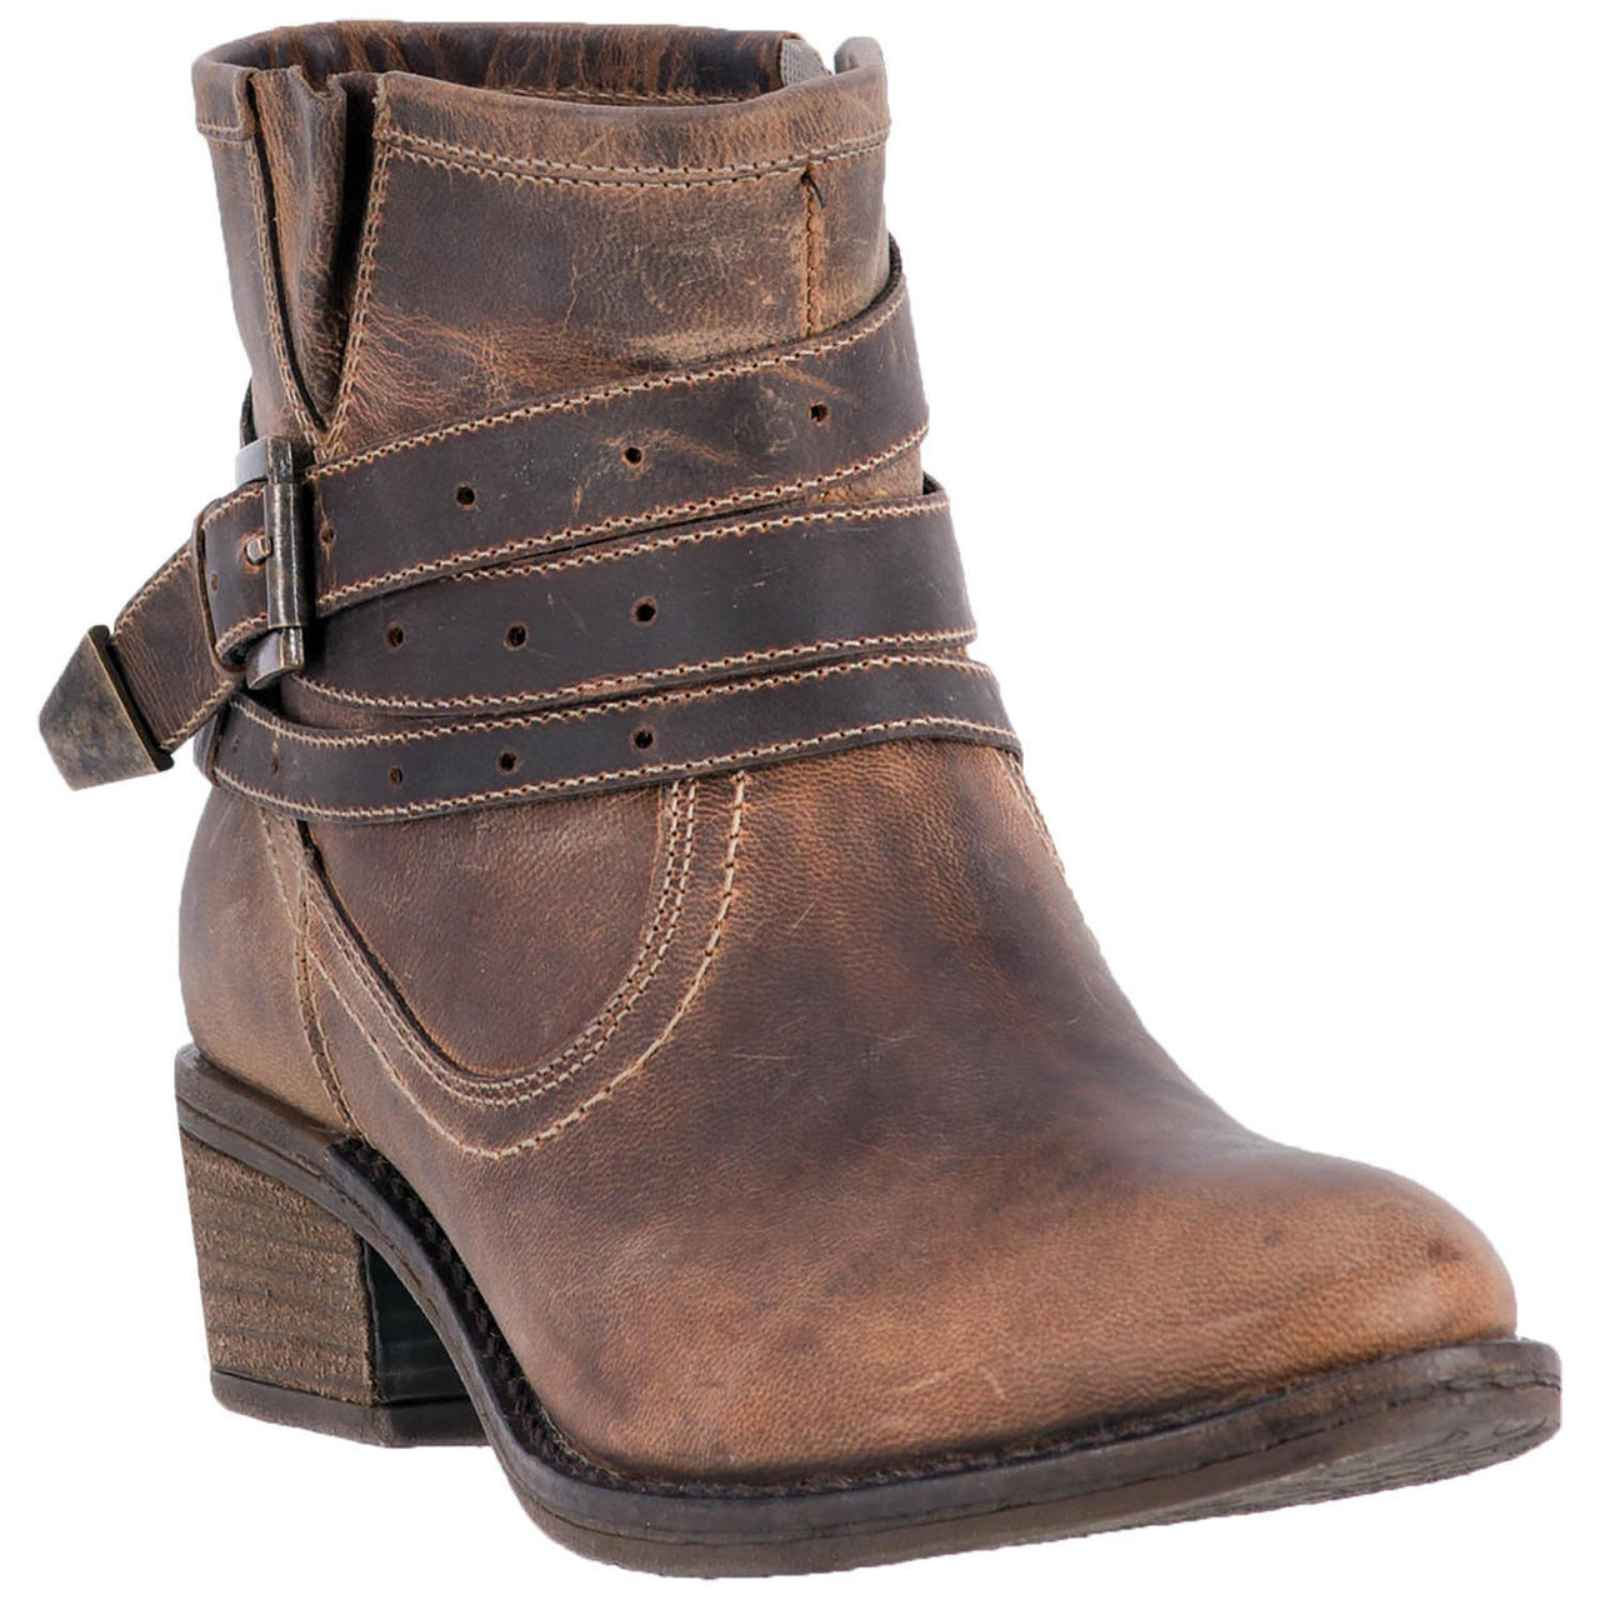 "Dingo Ladies 5"" Leather Boots Tan Bay Ridge Round Toe, DI 658 by Dingo"